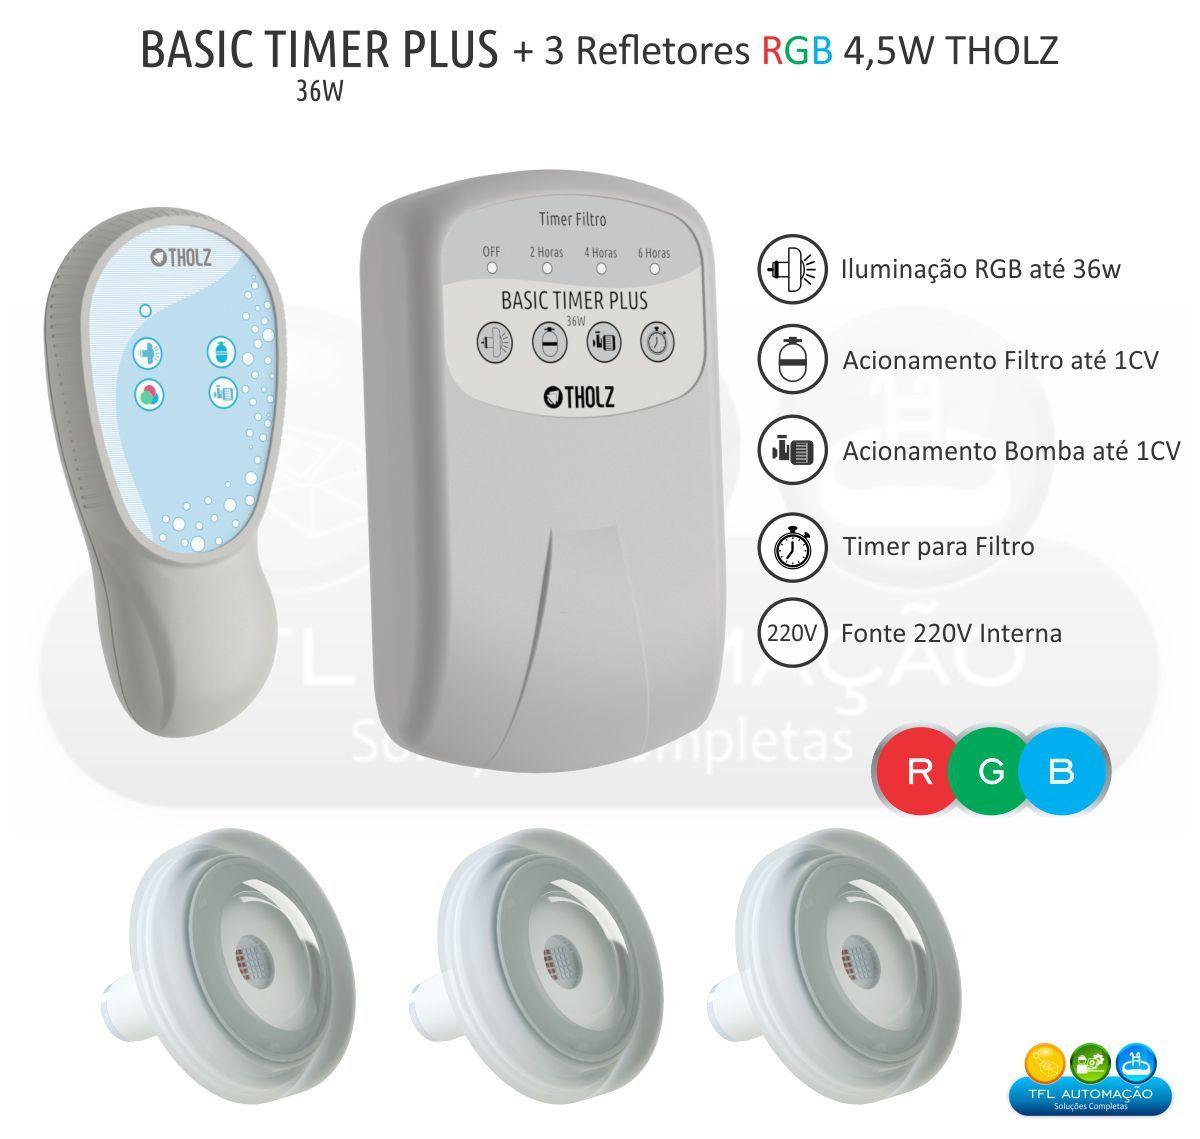 Kit Iluminação Piscina - 3 Leds Rgb 4,5w Tholz + Basic Timer Plus 36w